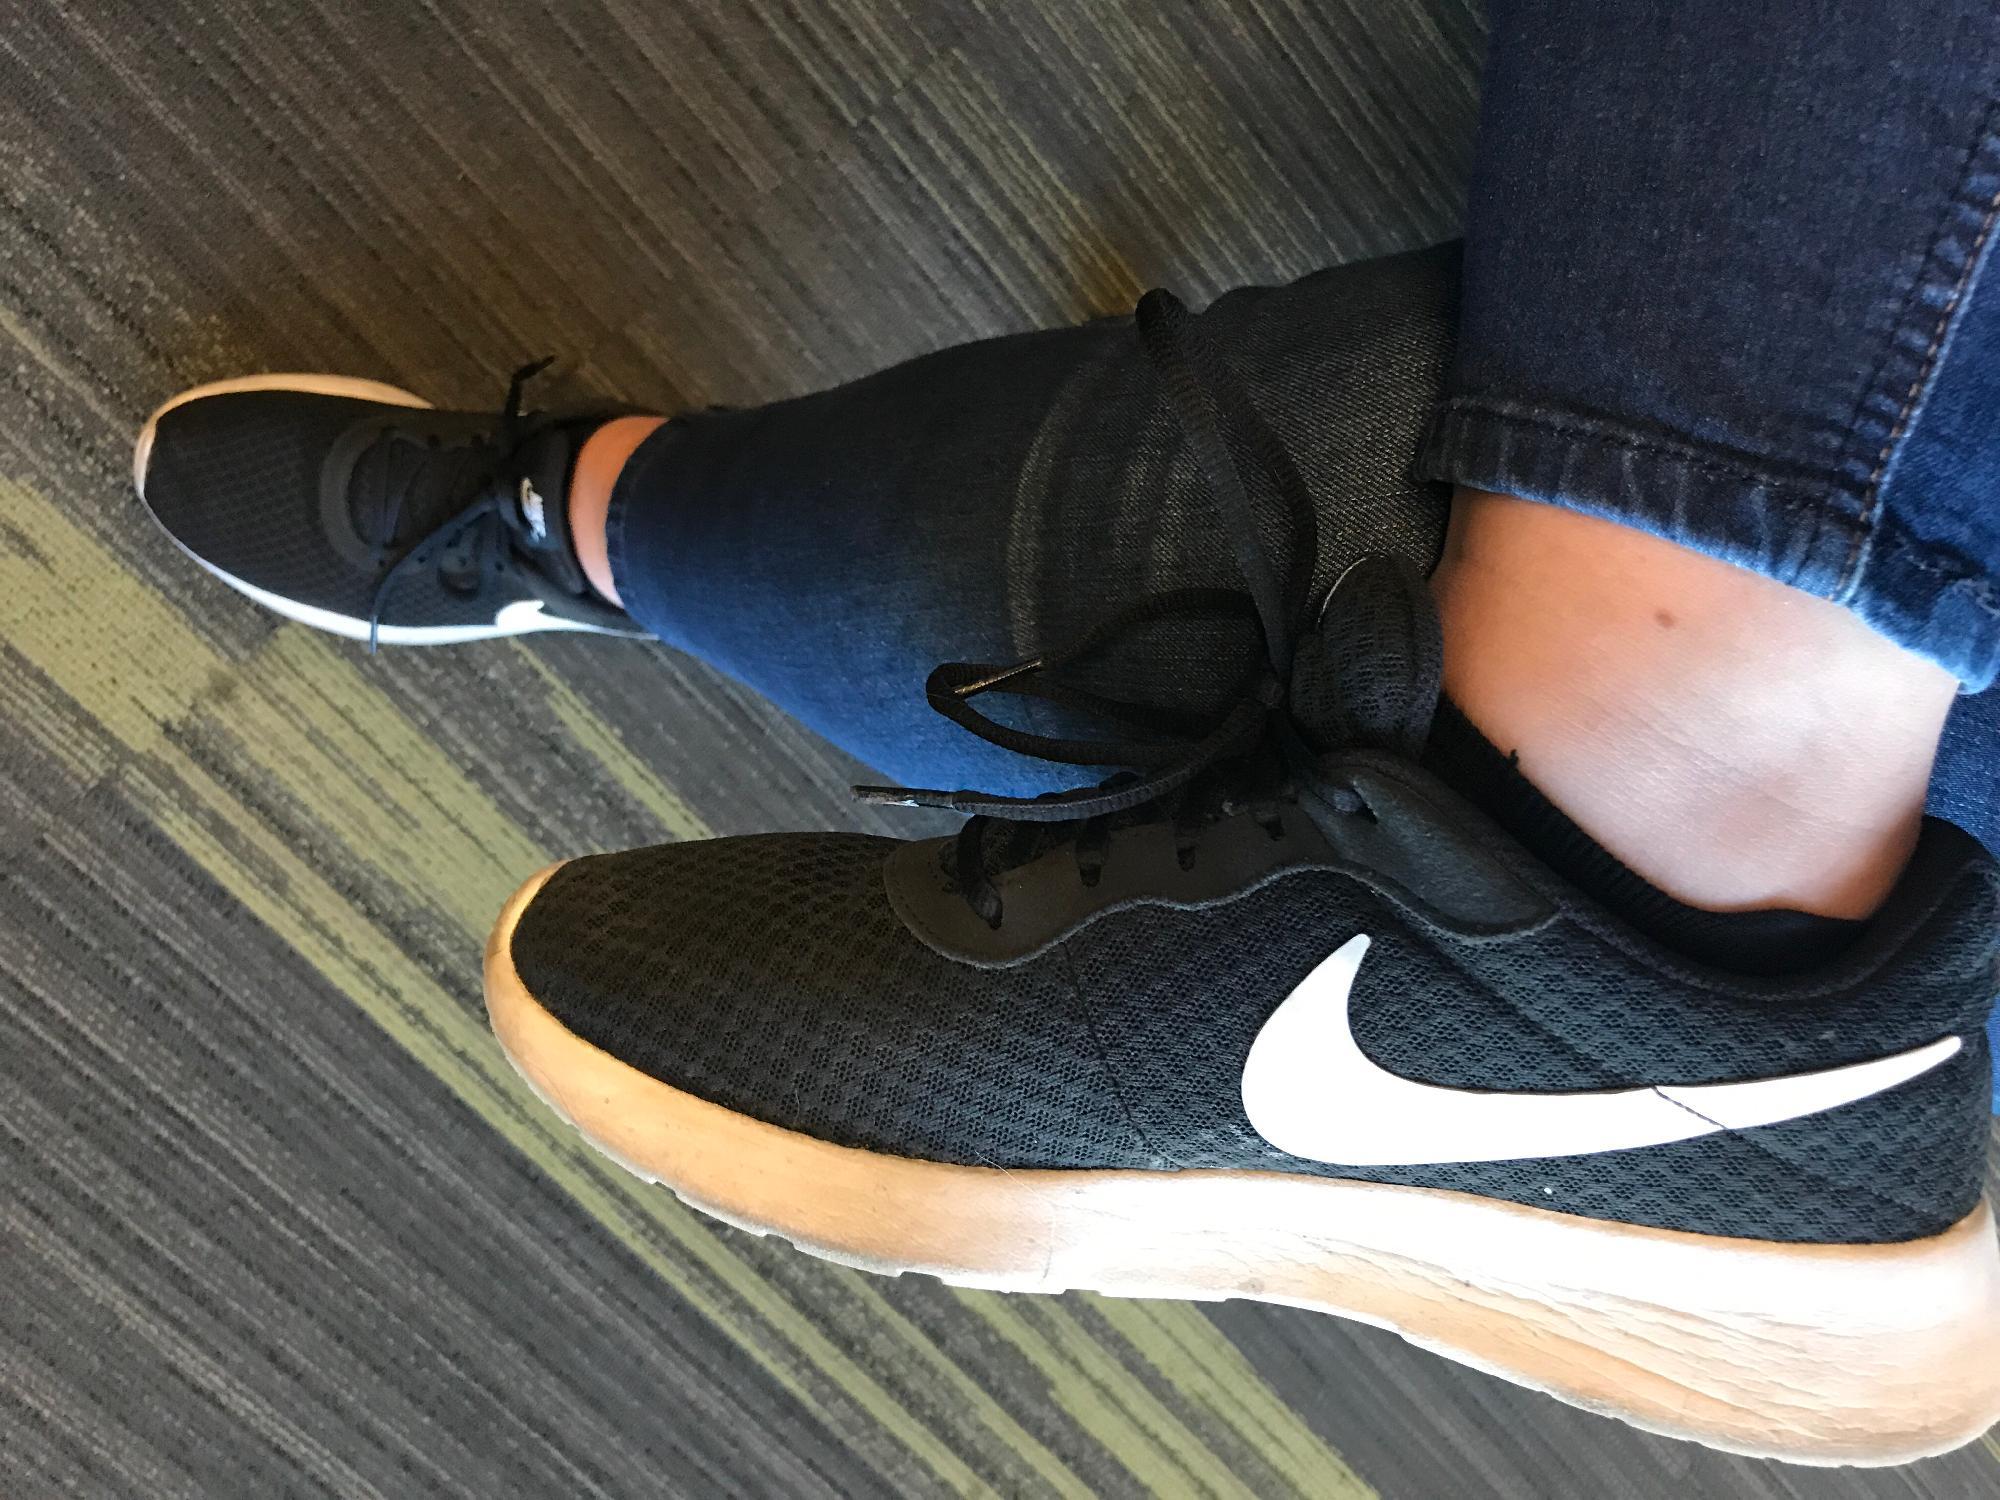 detailed look cheaper better Nike Tanjun | Zappos.com